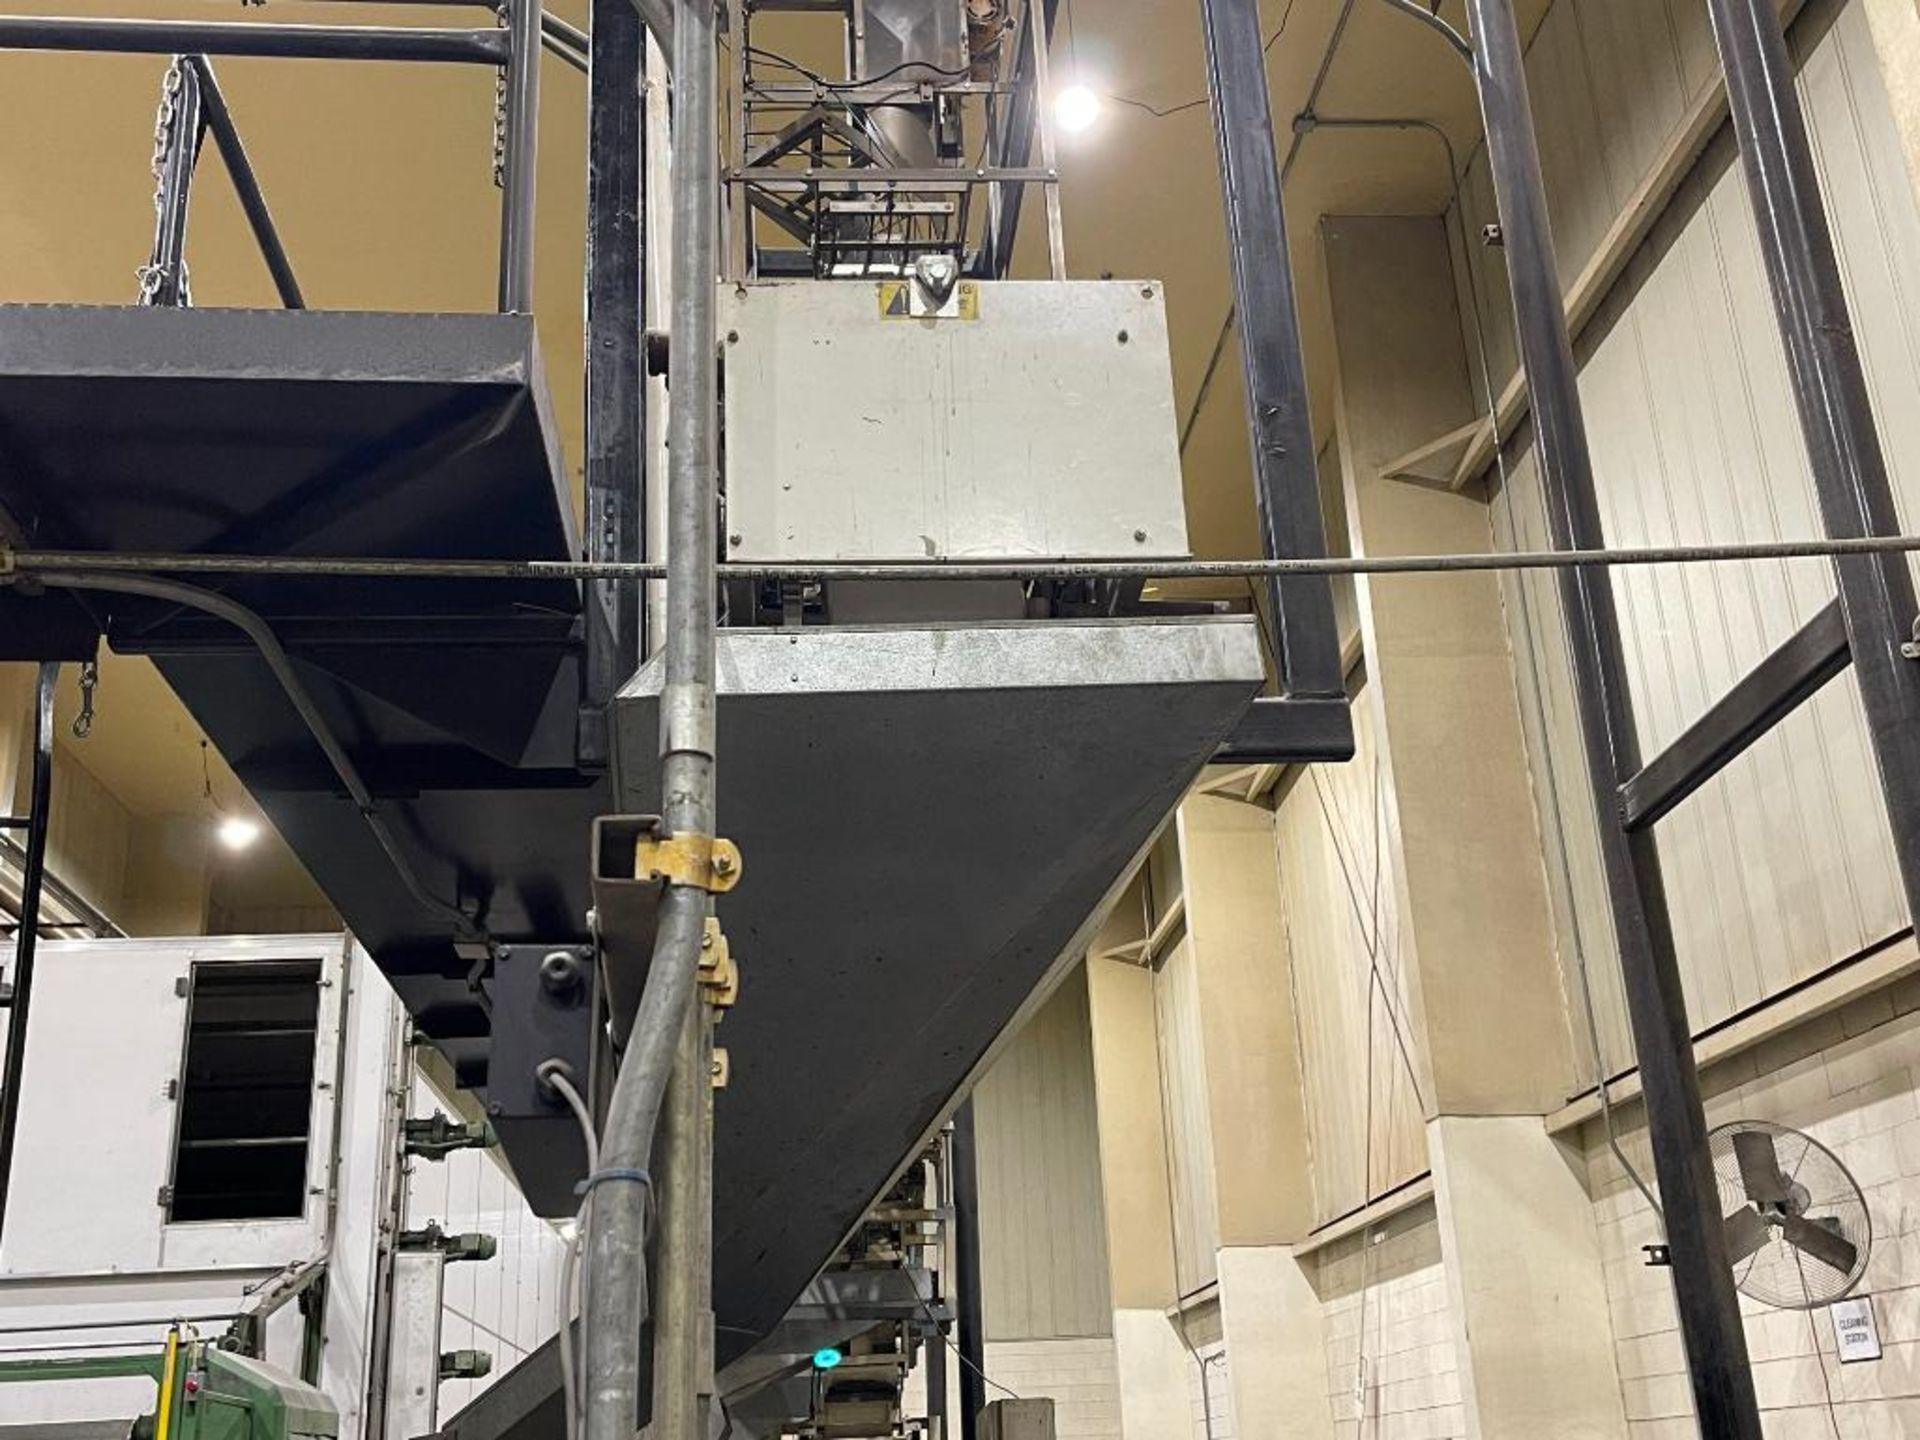 Meyer horizontal bucket elevator, model PQ-172-12-BCS - Image 19 of 19